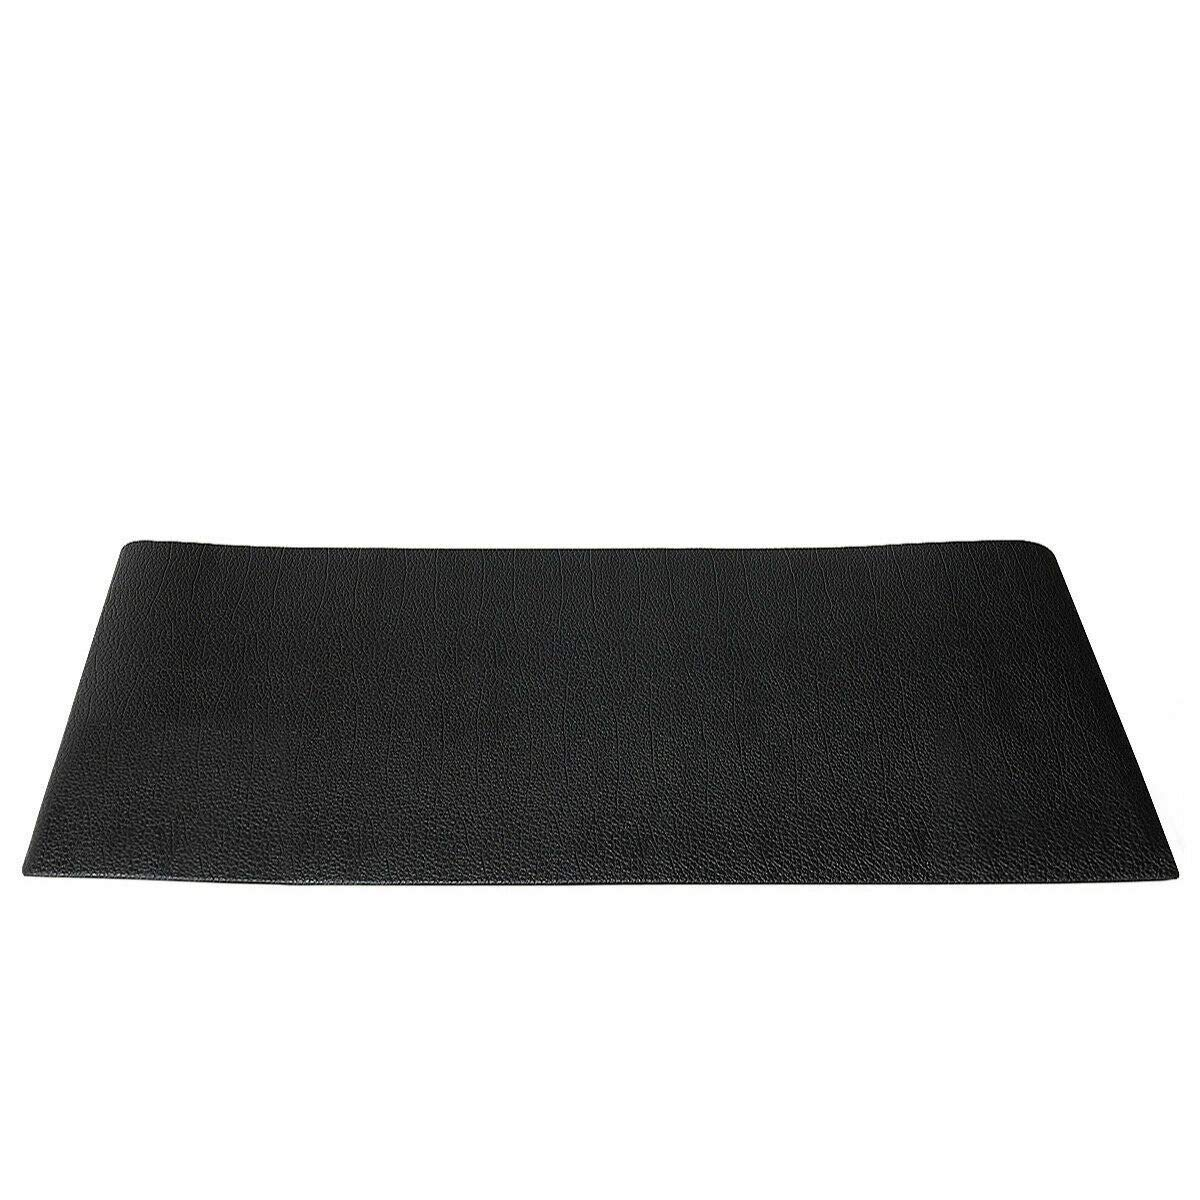 60/'/' x 26/'/' Treadmill Mat Gymnastic Aerobic Exercise Mat Floor Protector PVC